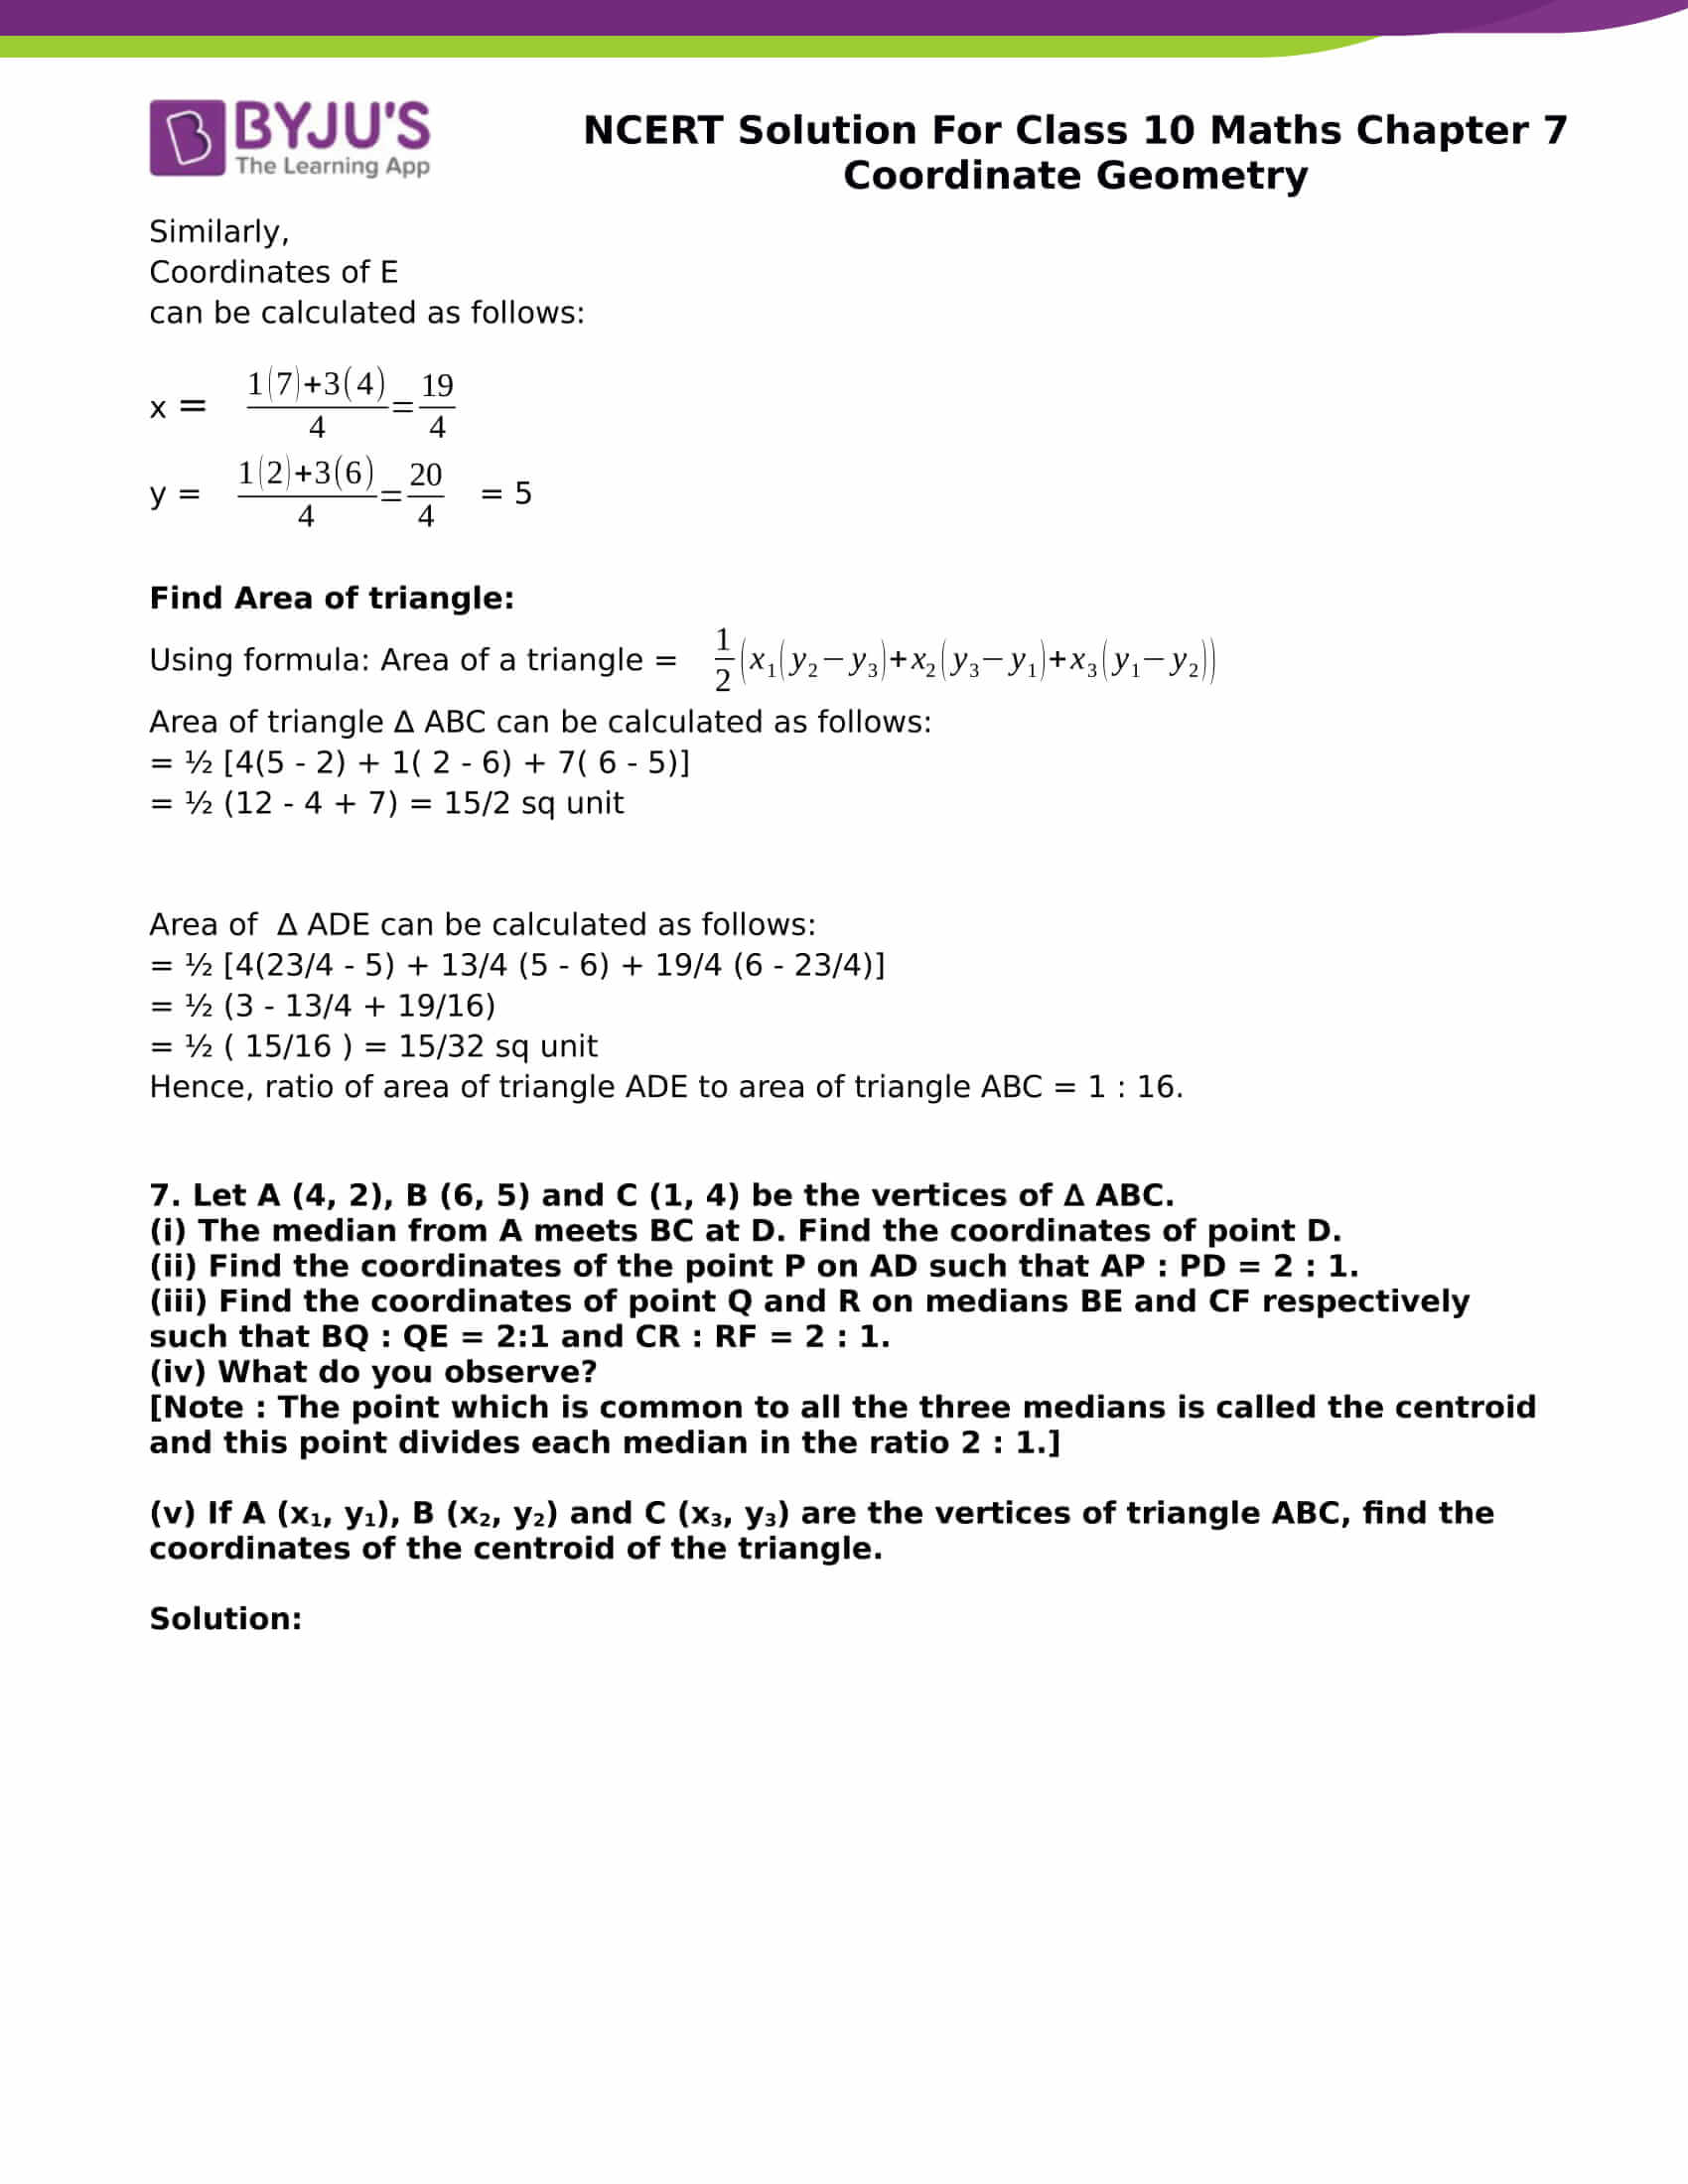 NCERT Solution for class 10 Maths chapter 7 Coordinate Geometry Part 28